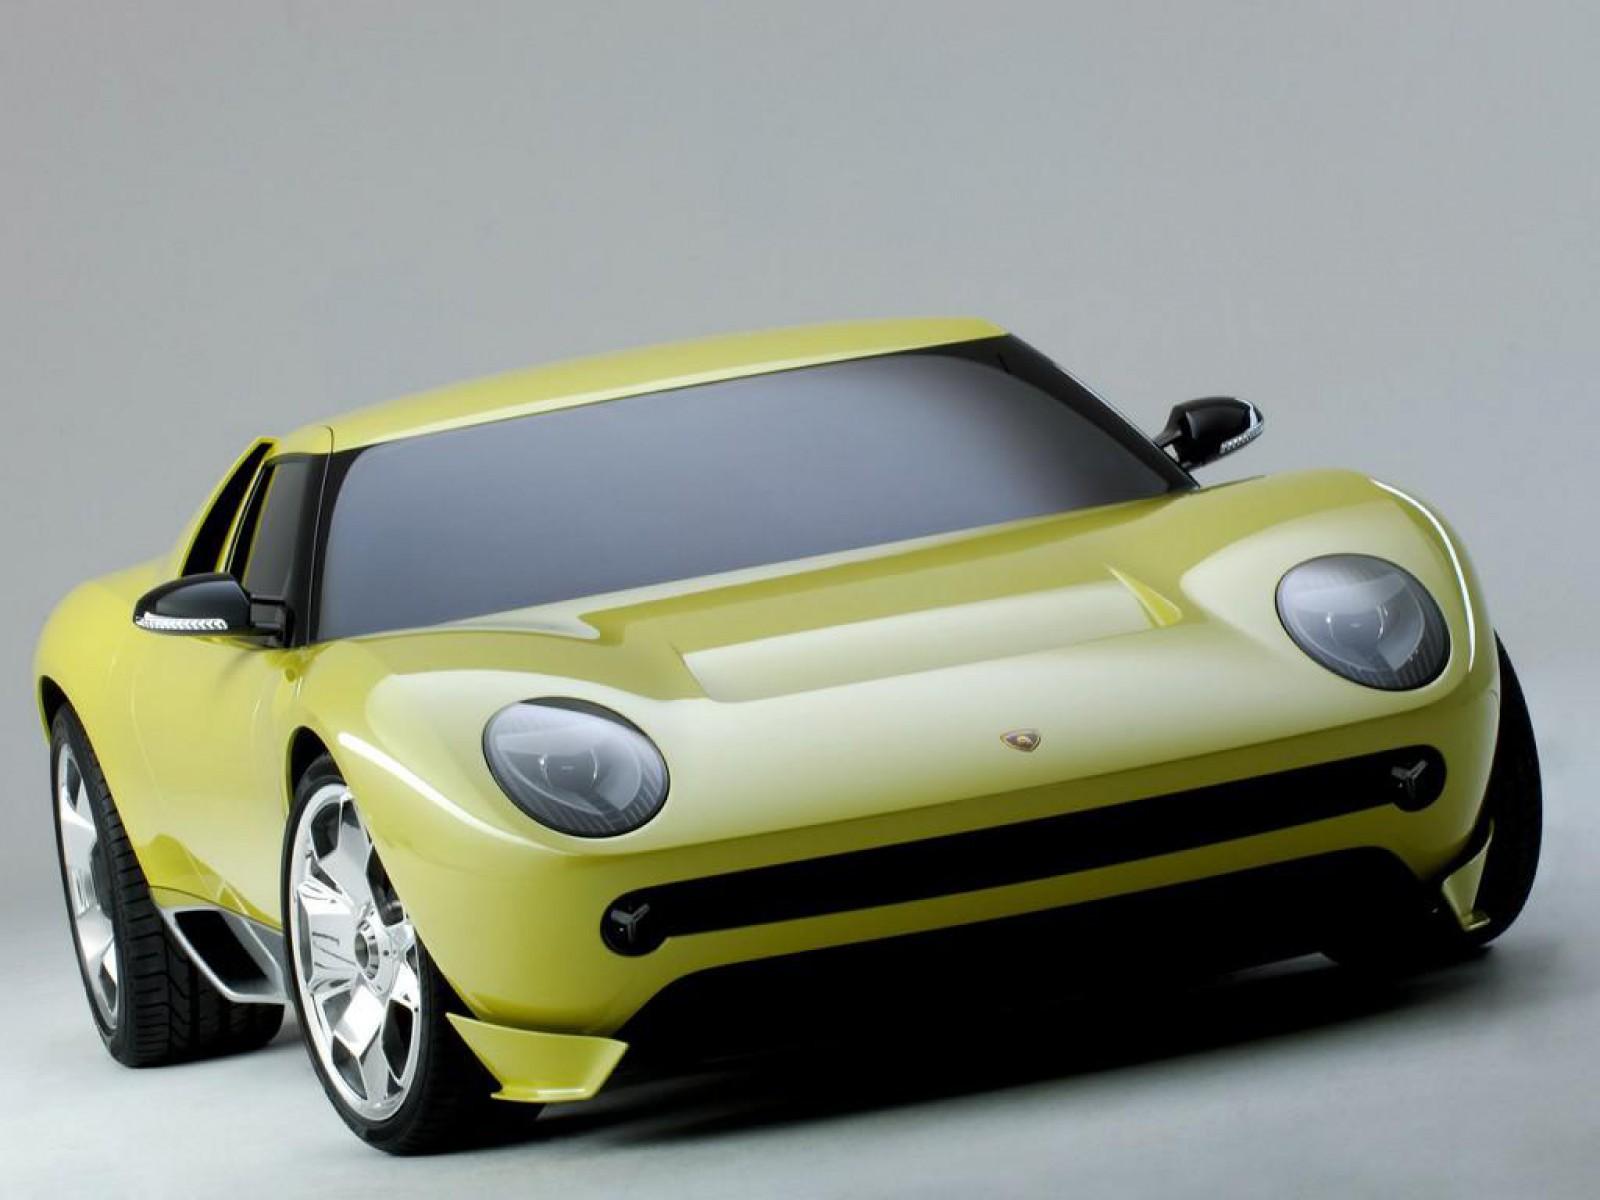 Luxury Lamborghini Cars: Lamborghini Miura Concept